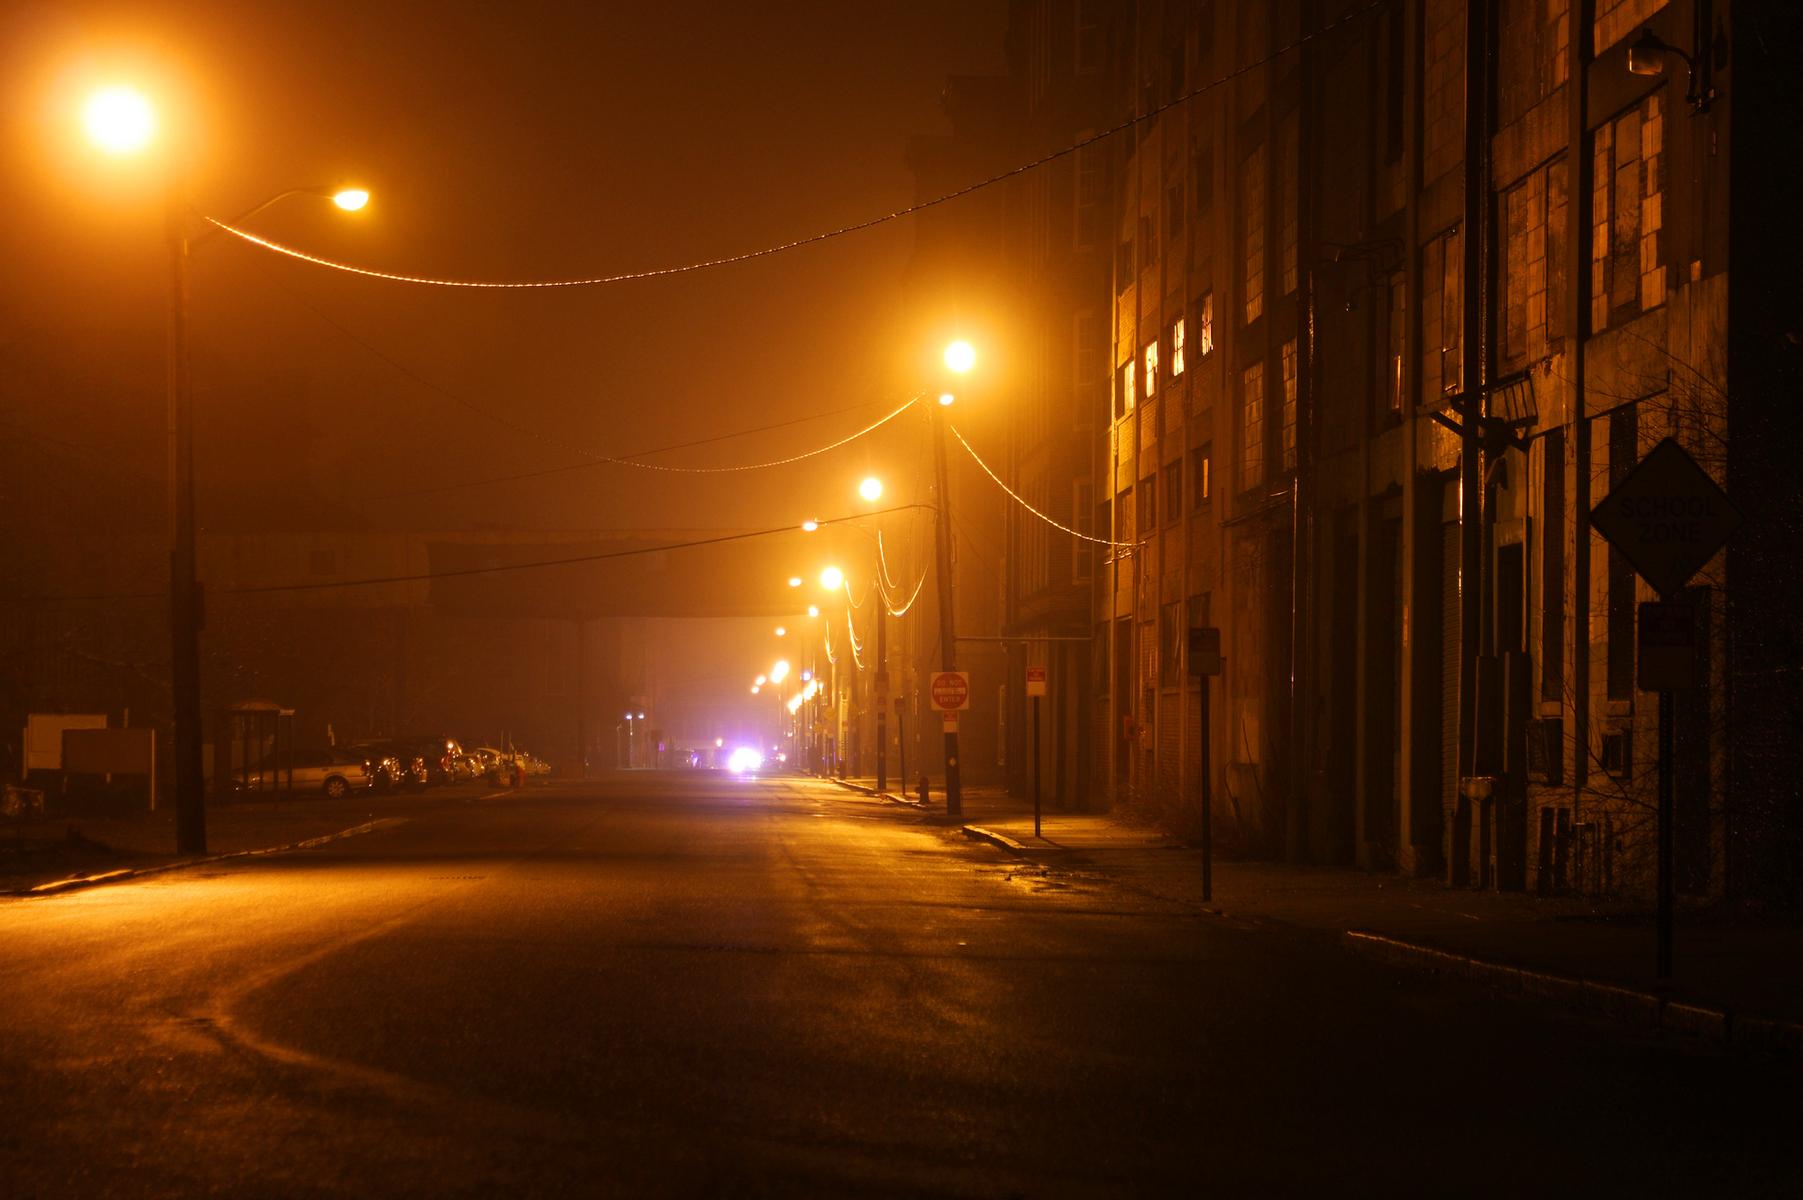 Light Pollution Photo Essay